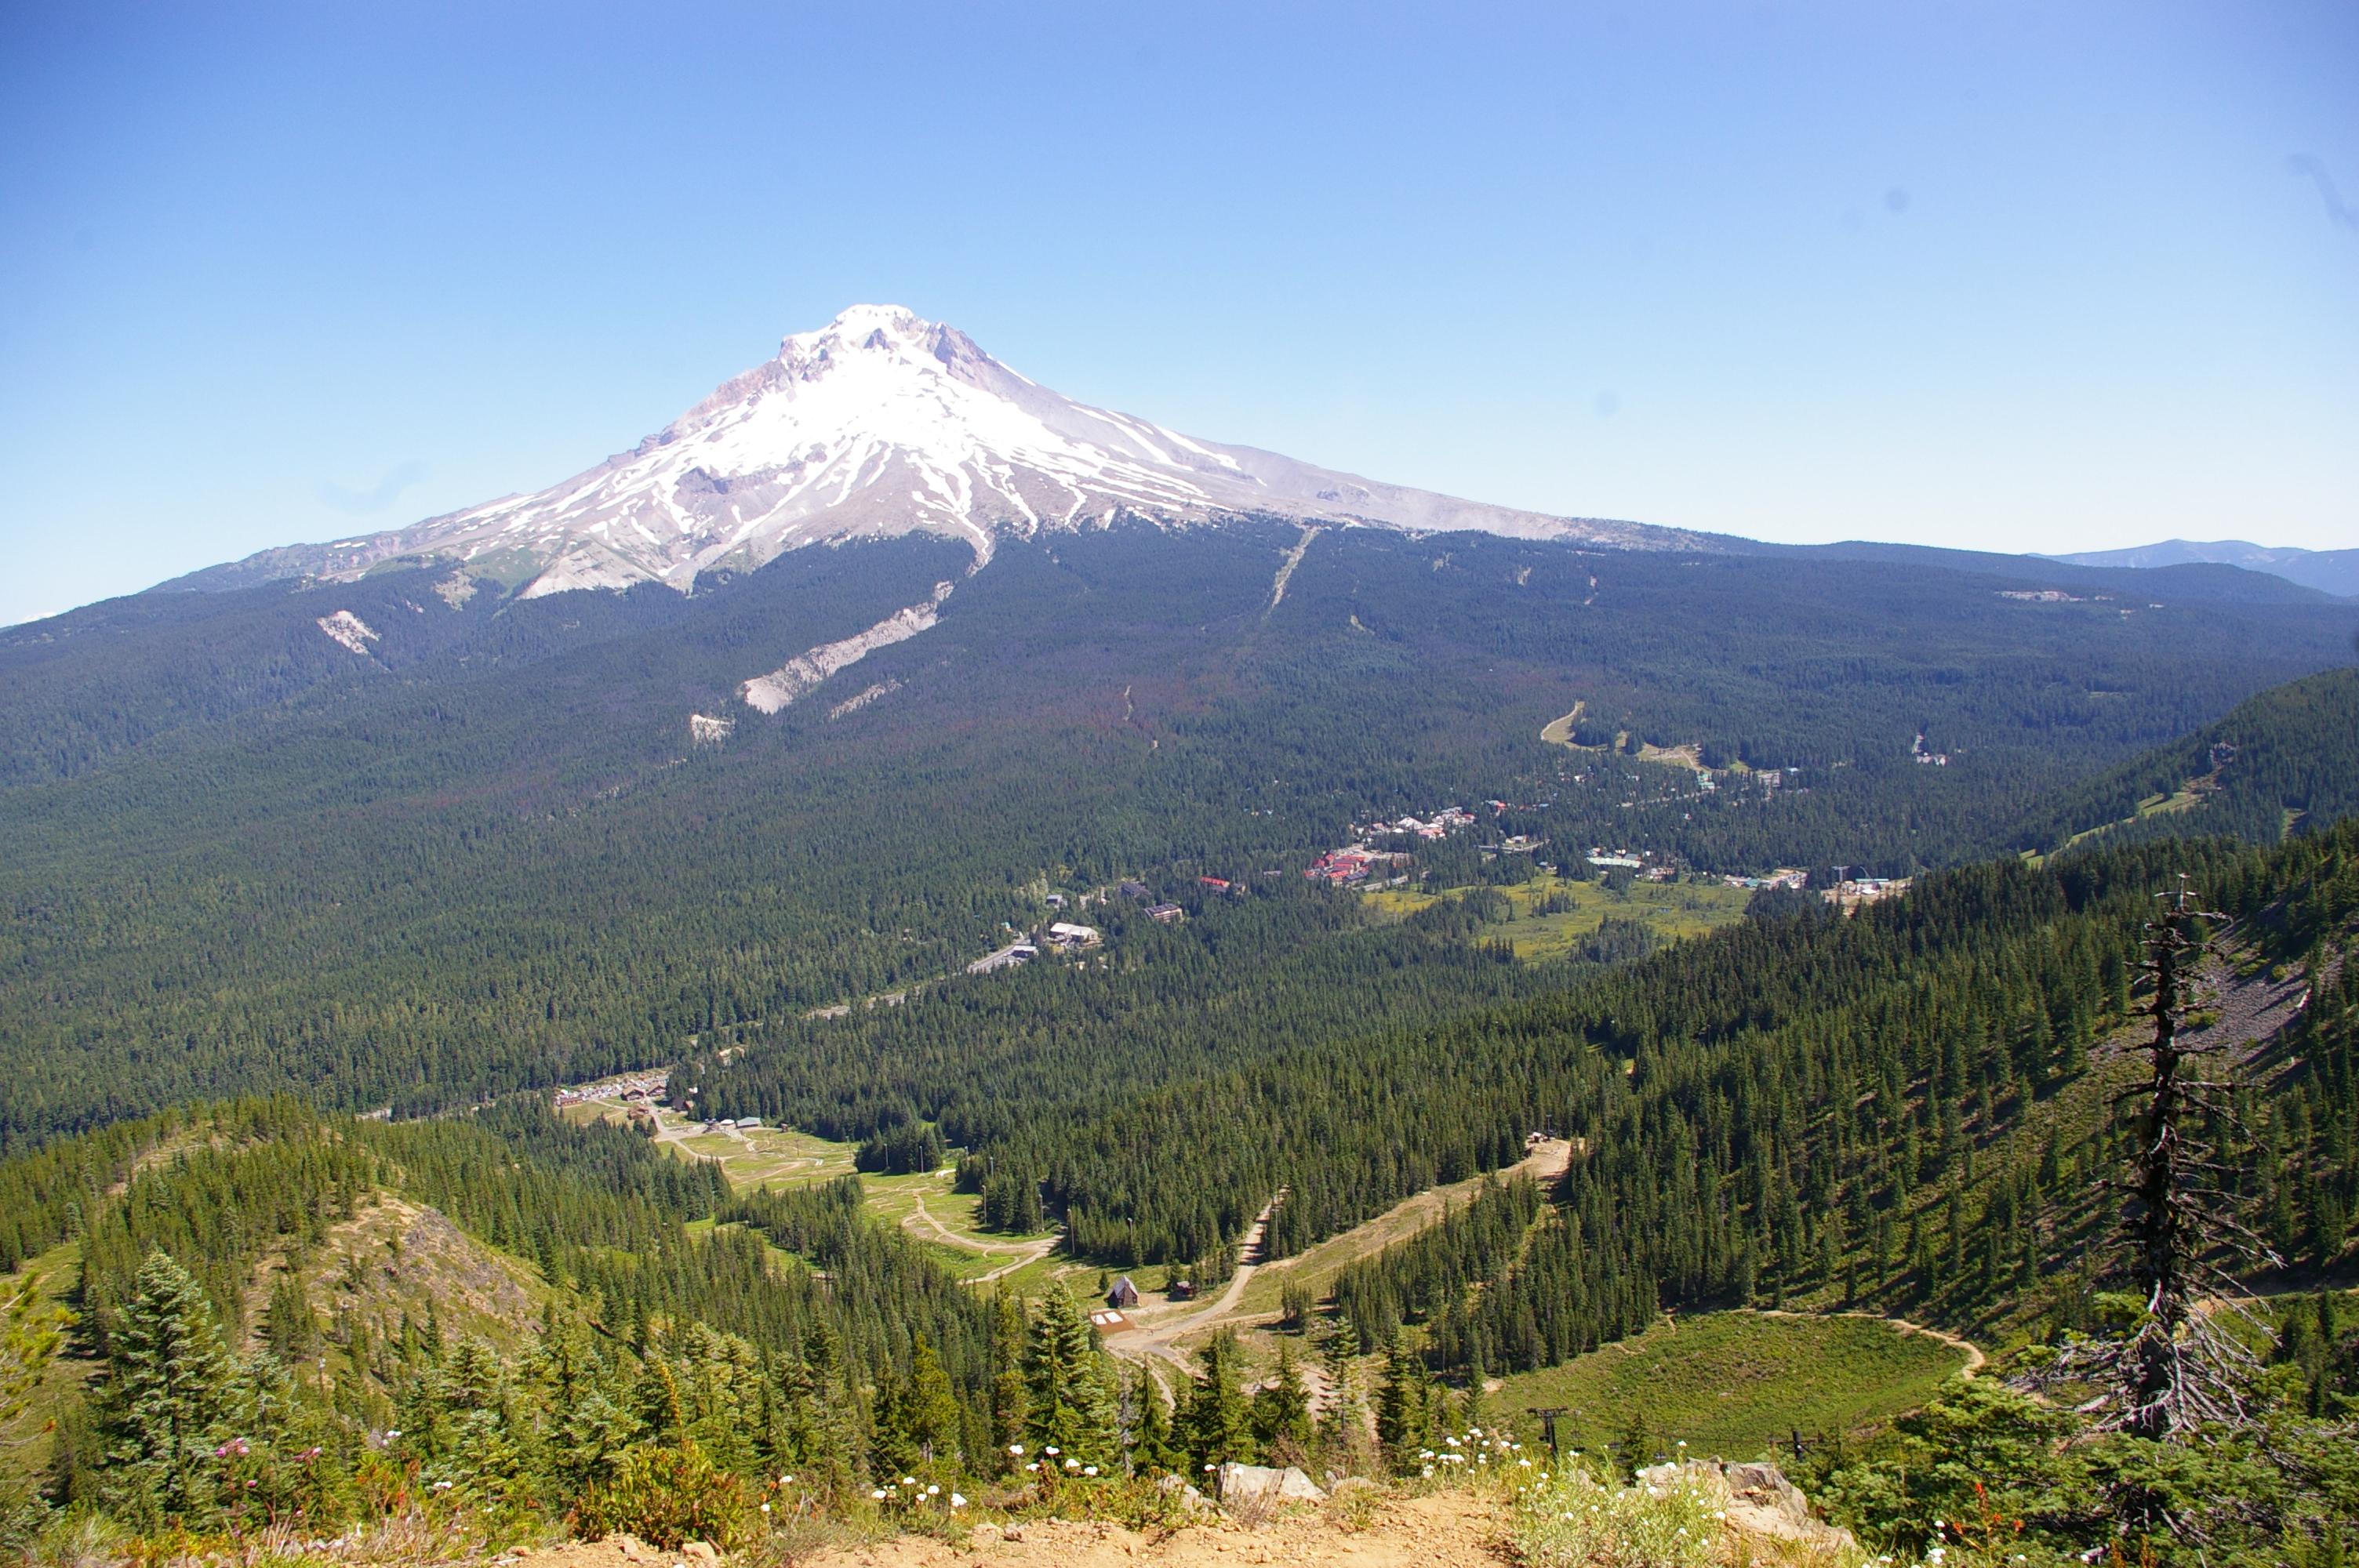 Mt Hood Skibowl - Winter and Summer Resort